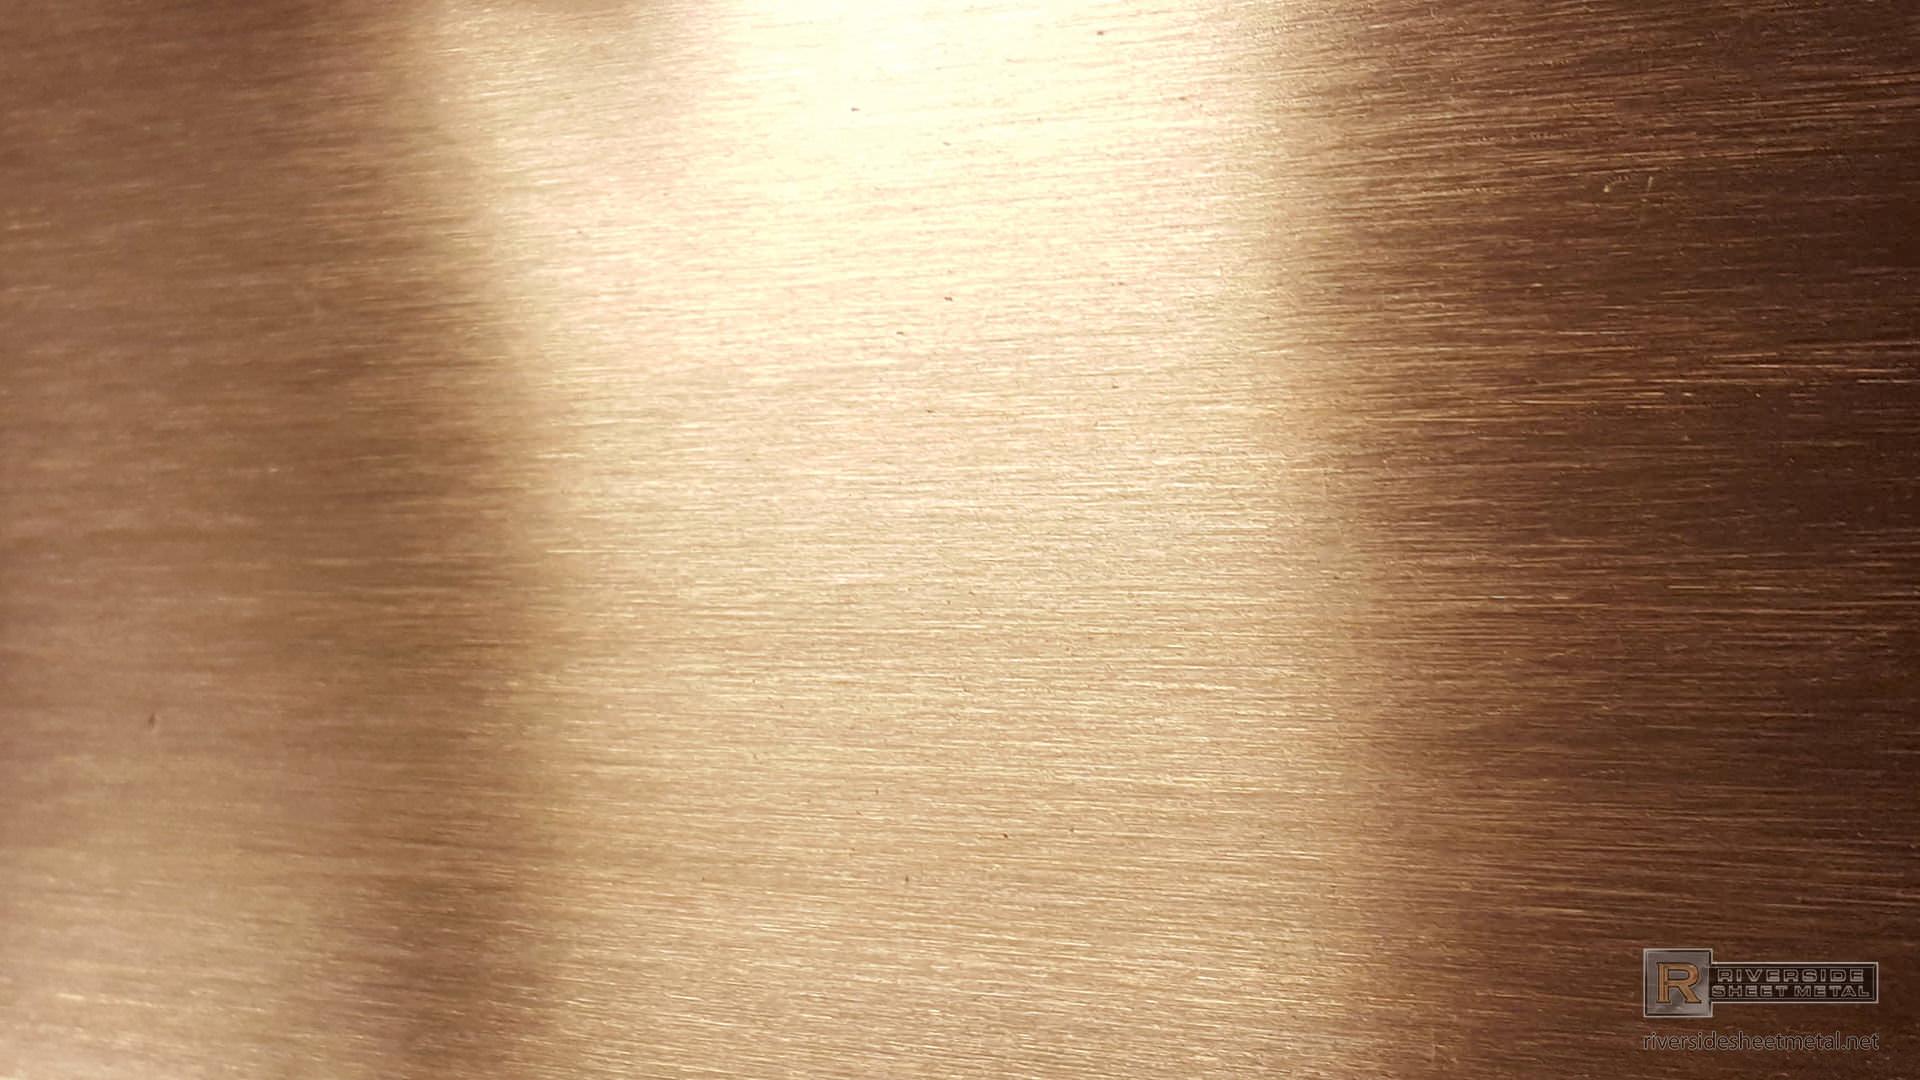 Copper Sheets Coils 16 Oz 20 Oz 24 Oz And 48 Oz